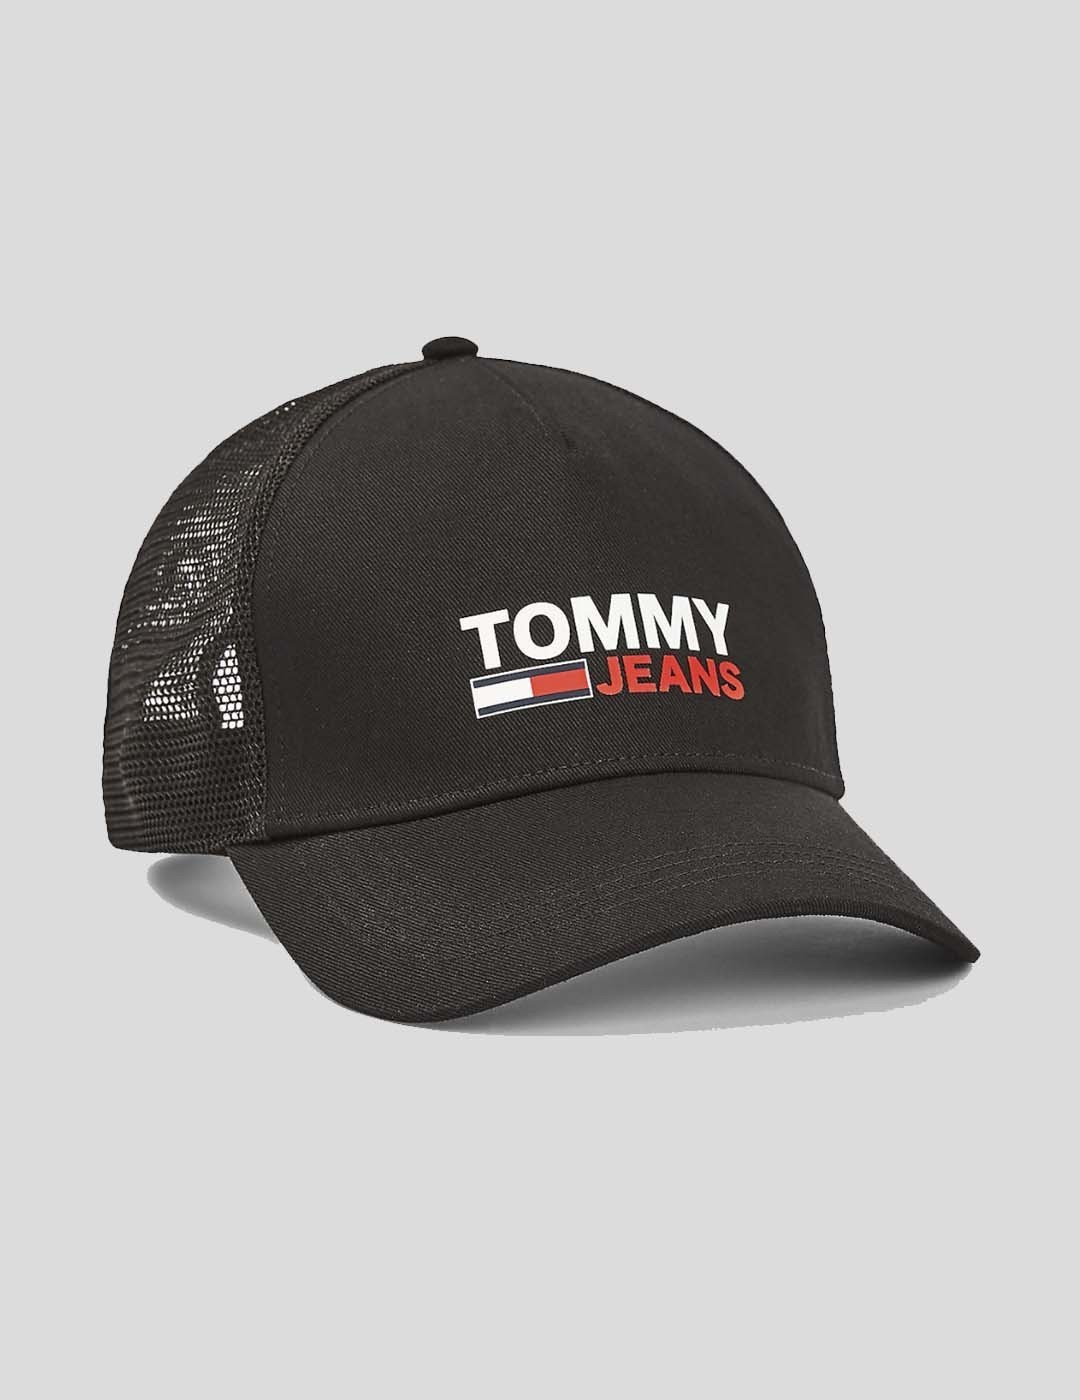 GORRA TOMMY JEANS TJM LOGO TRUCKER CAP BLACK